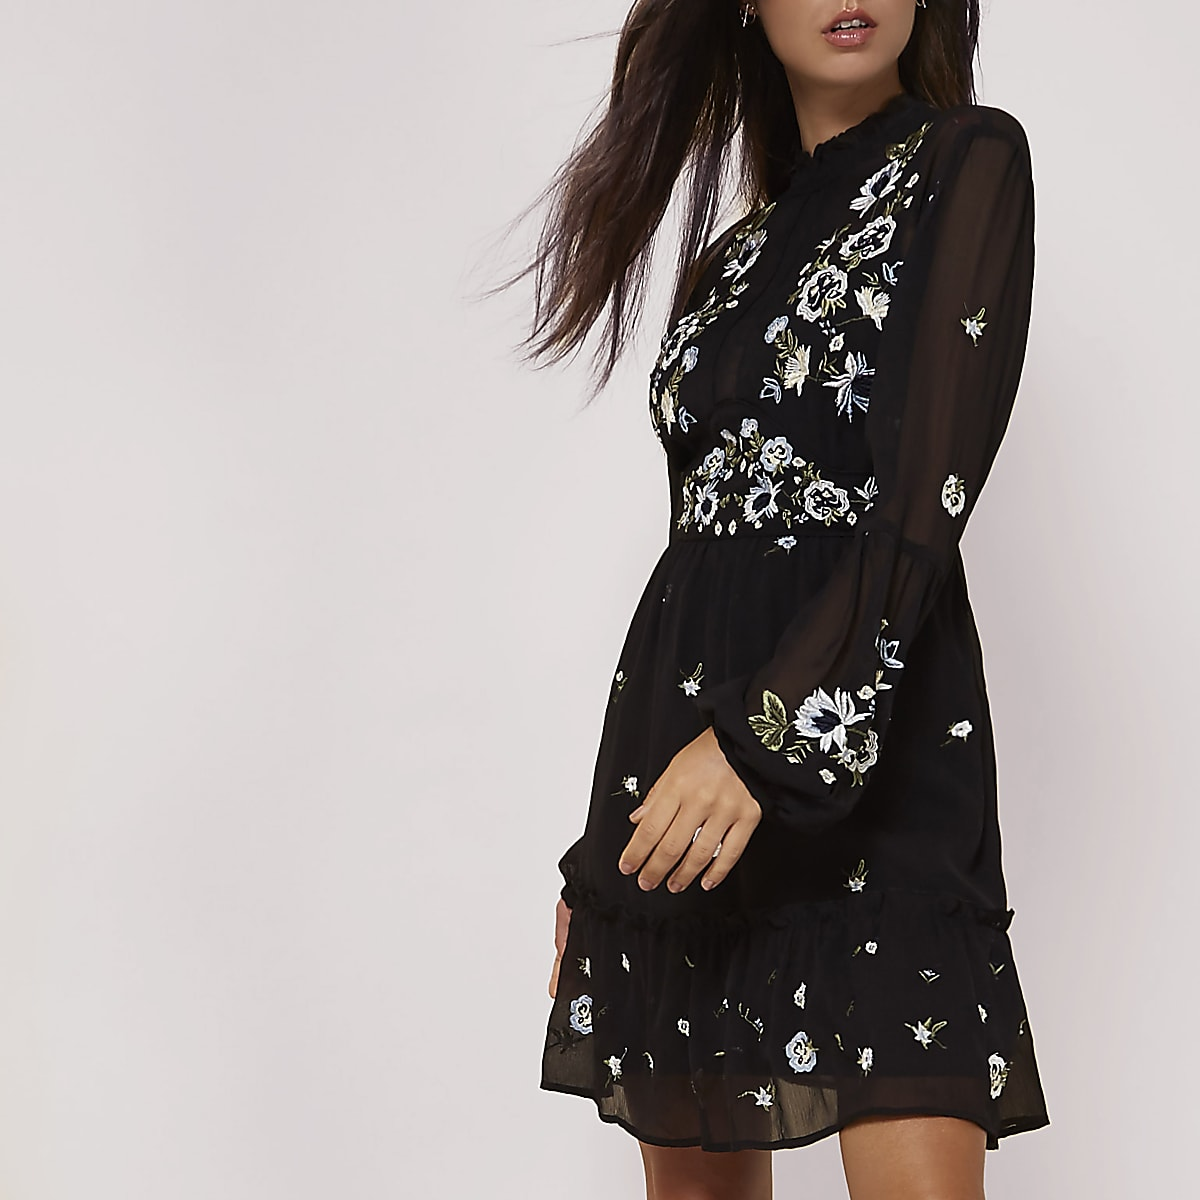 e064c8b1777d High Neck Long Sleeve Floral Skater Dress – DACC